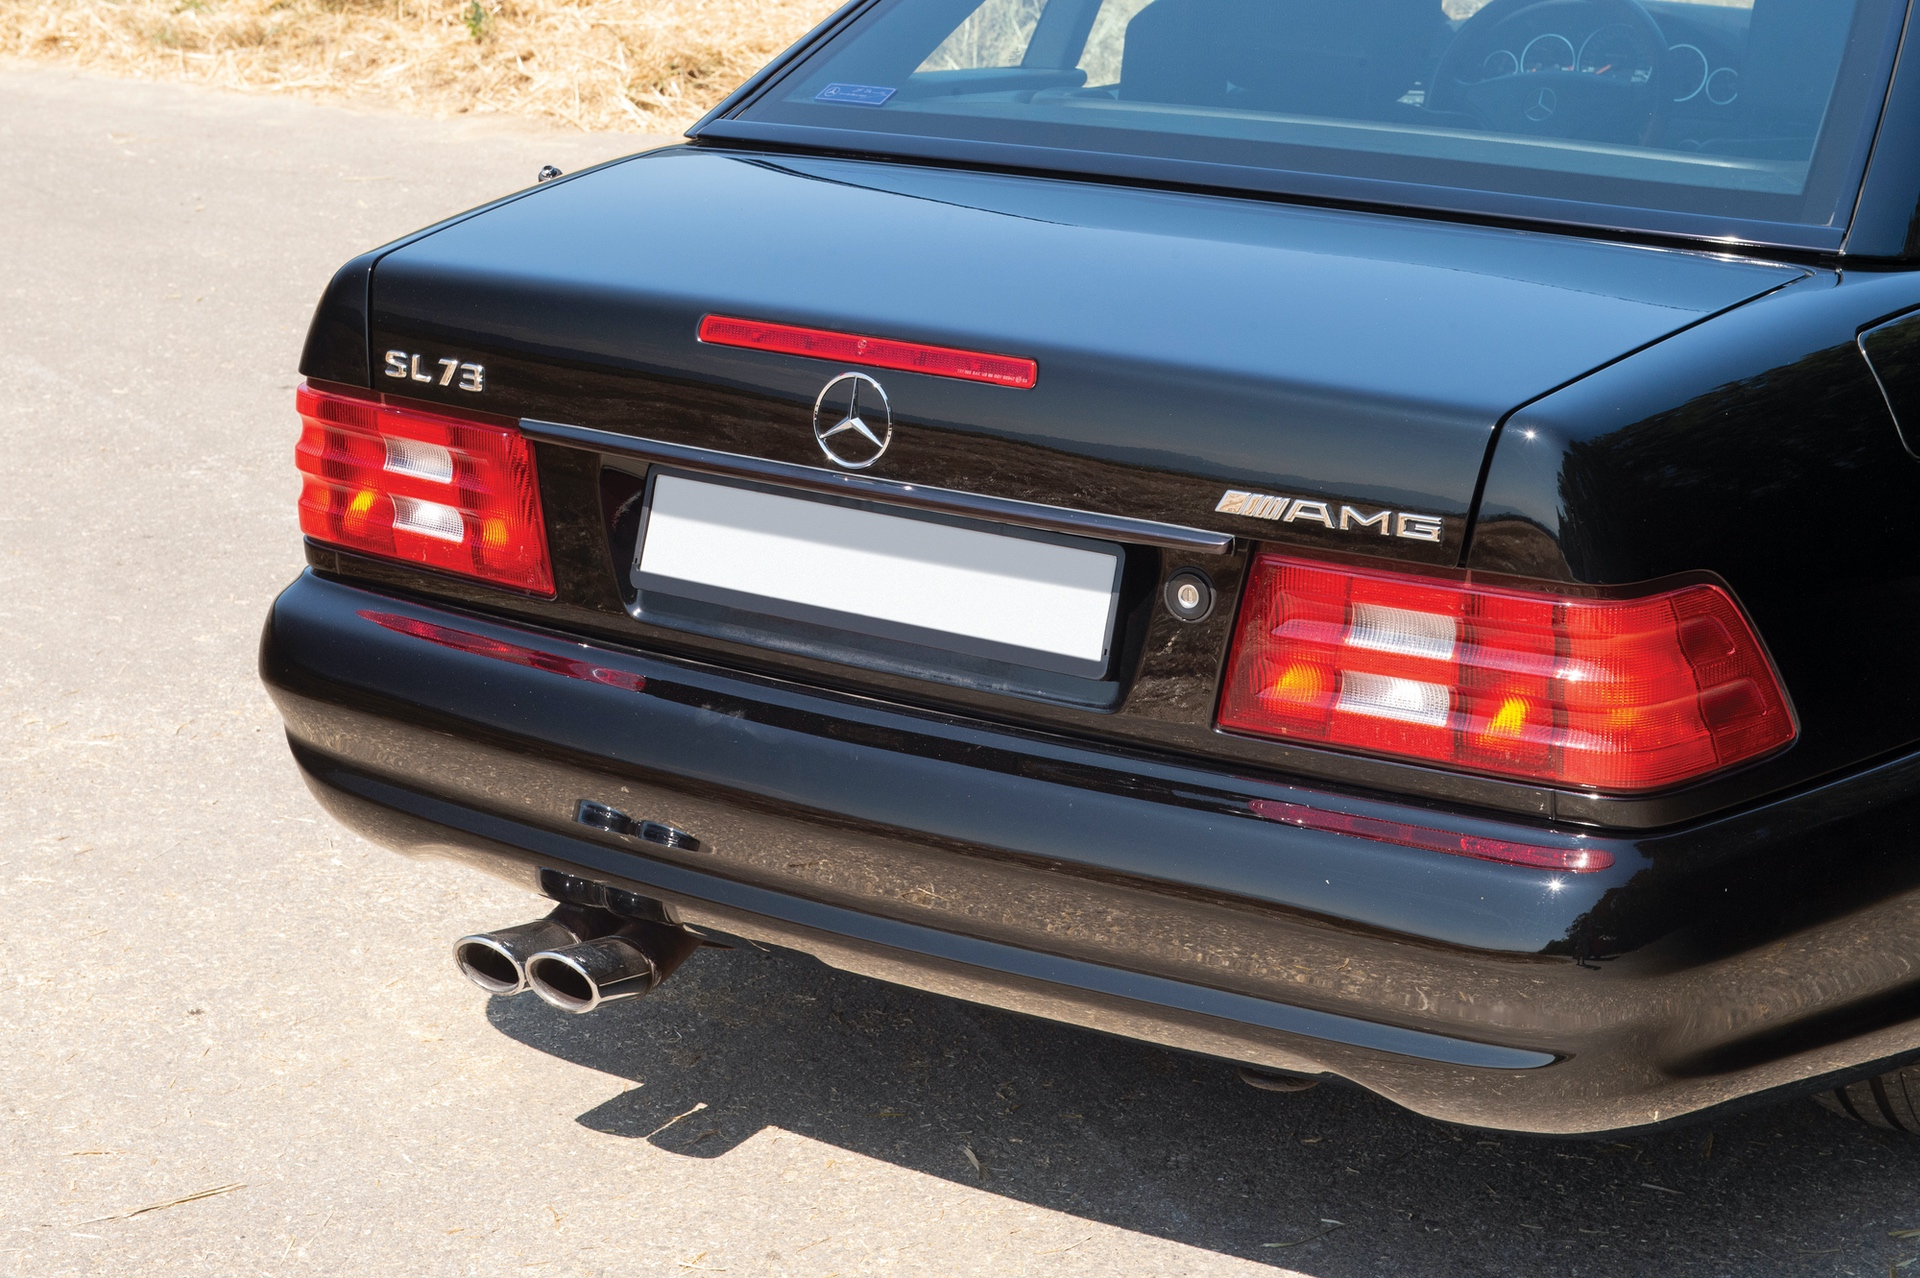 1999-Mercedes-Benz-SL-73-AMG-_14